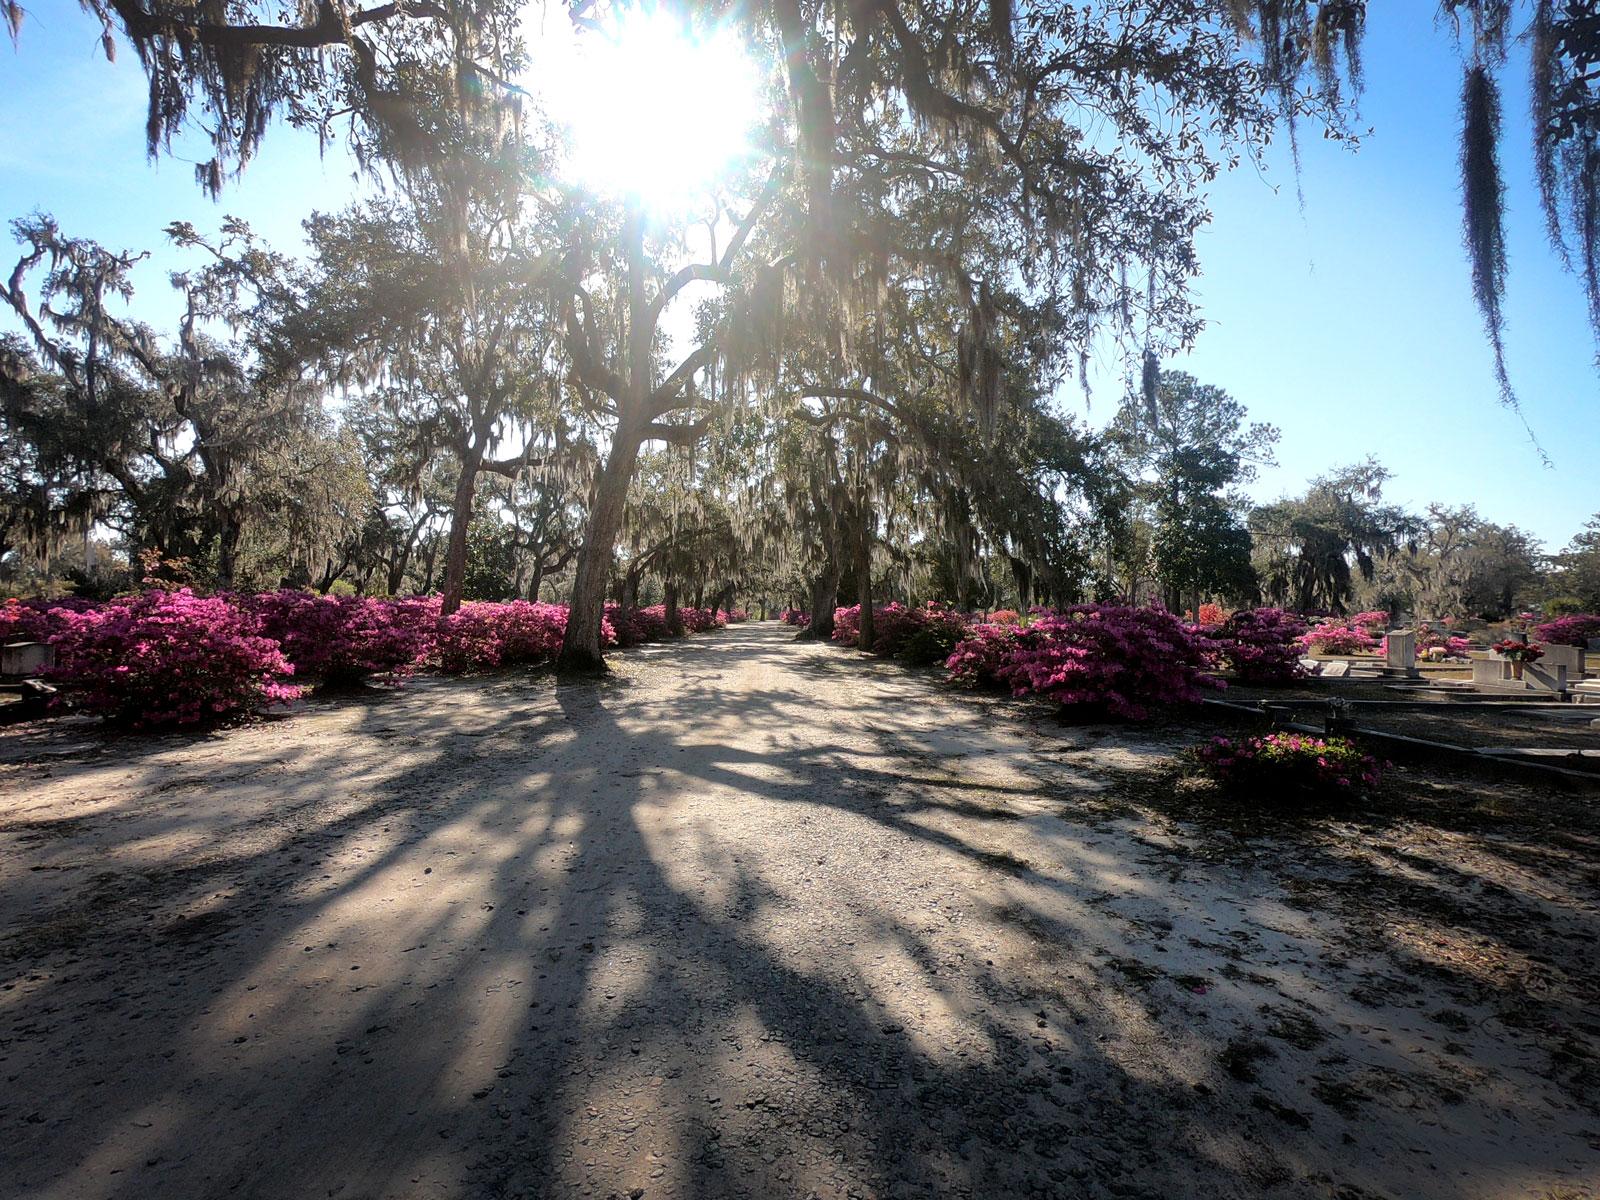 Narrow road with Spanish moss draped live oaks and blooming azaleas in Bonaventure Cemetery, Savannah, Georgia